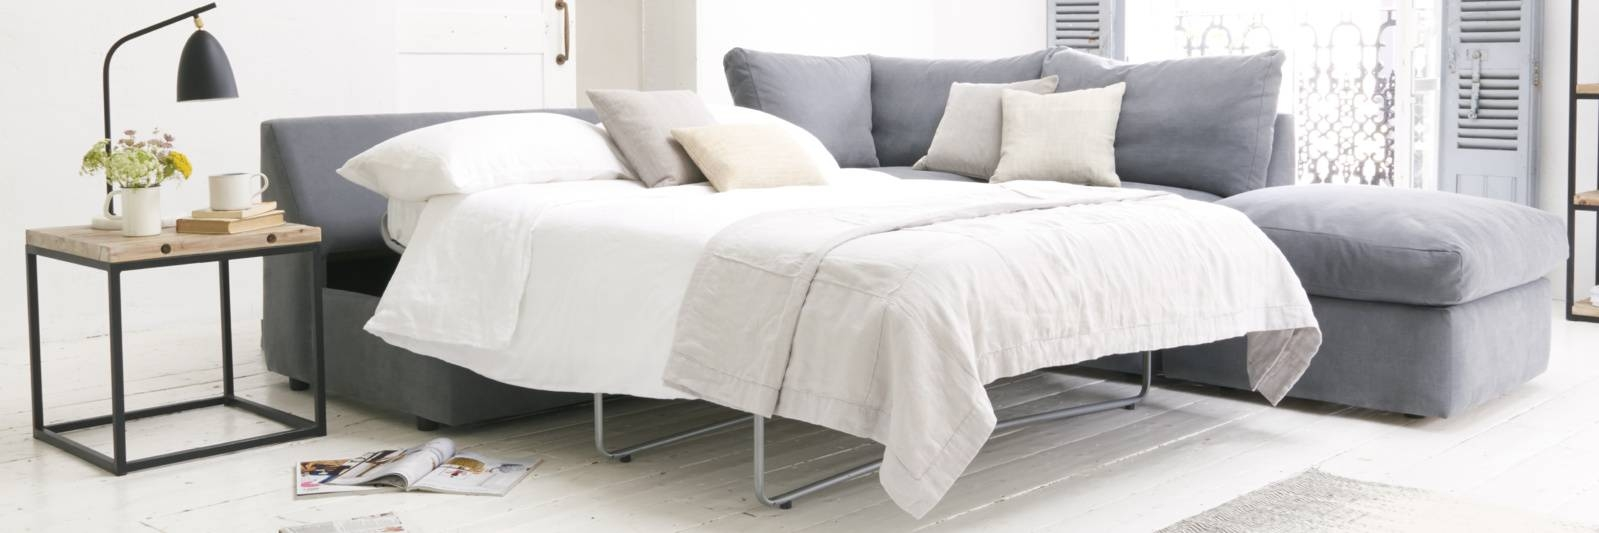 Sofas Center : Tags Leather Sofa Luxurious Luxury Sofas L Singular inside Luxury Sofa Beds (Image 28 of 30)